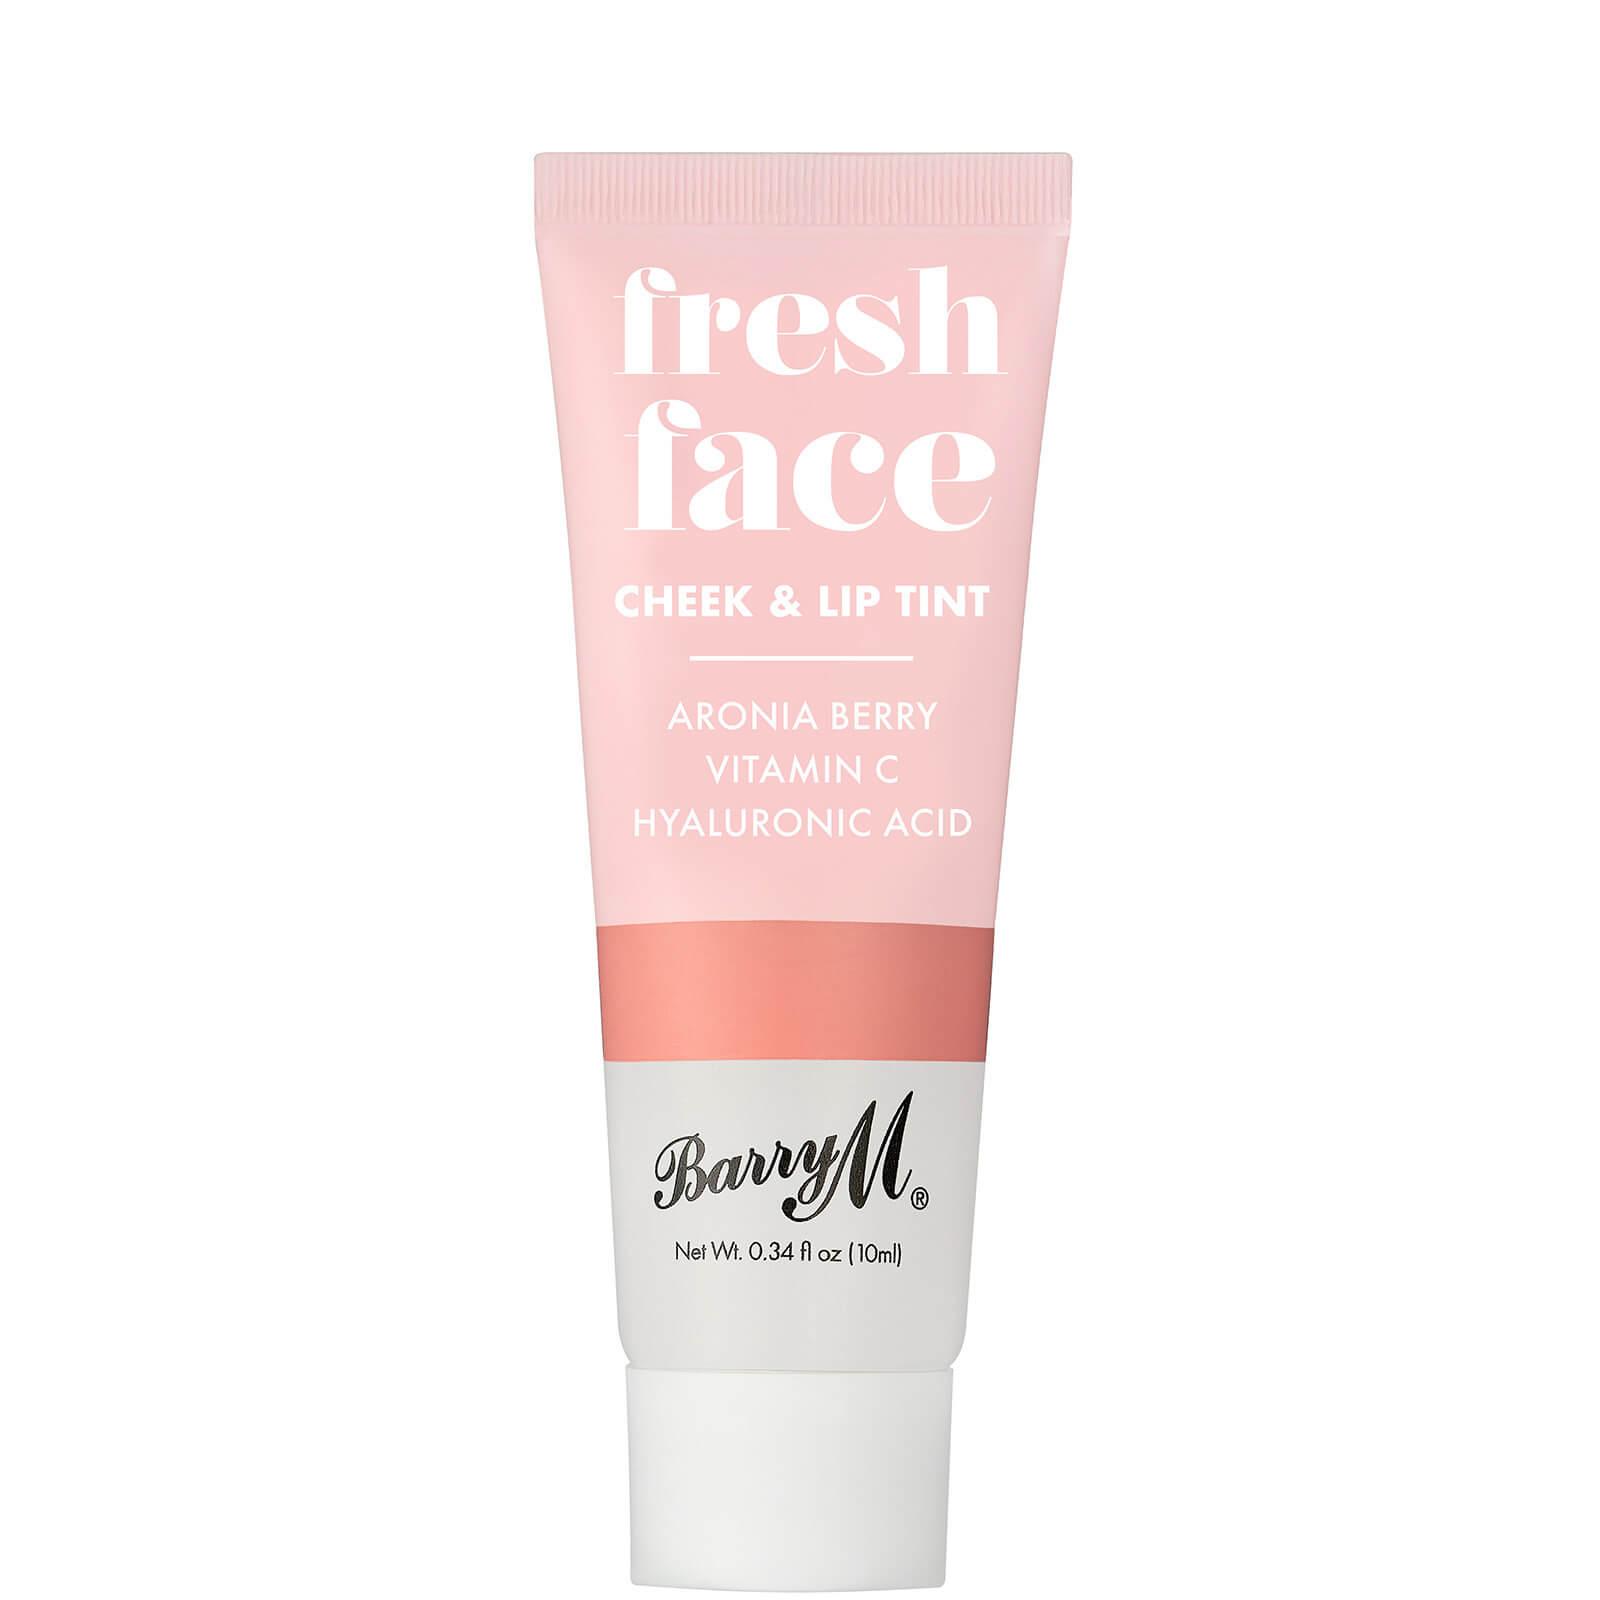 Купить Barry M Cosmetics Fresh Face Cheek and Lip Tint 10ml (Various Shades) - Peach Glow